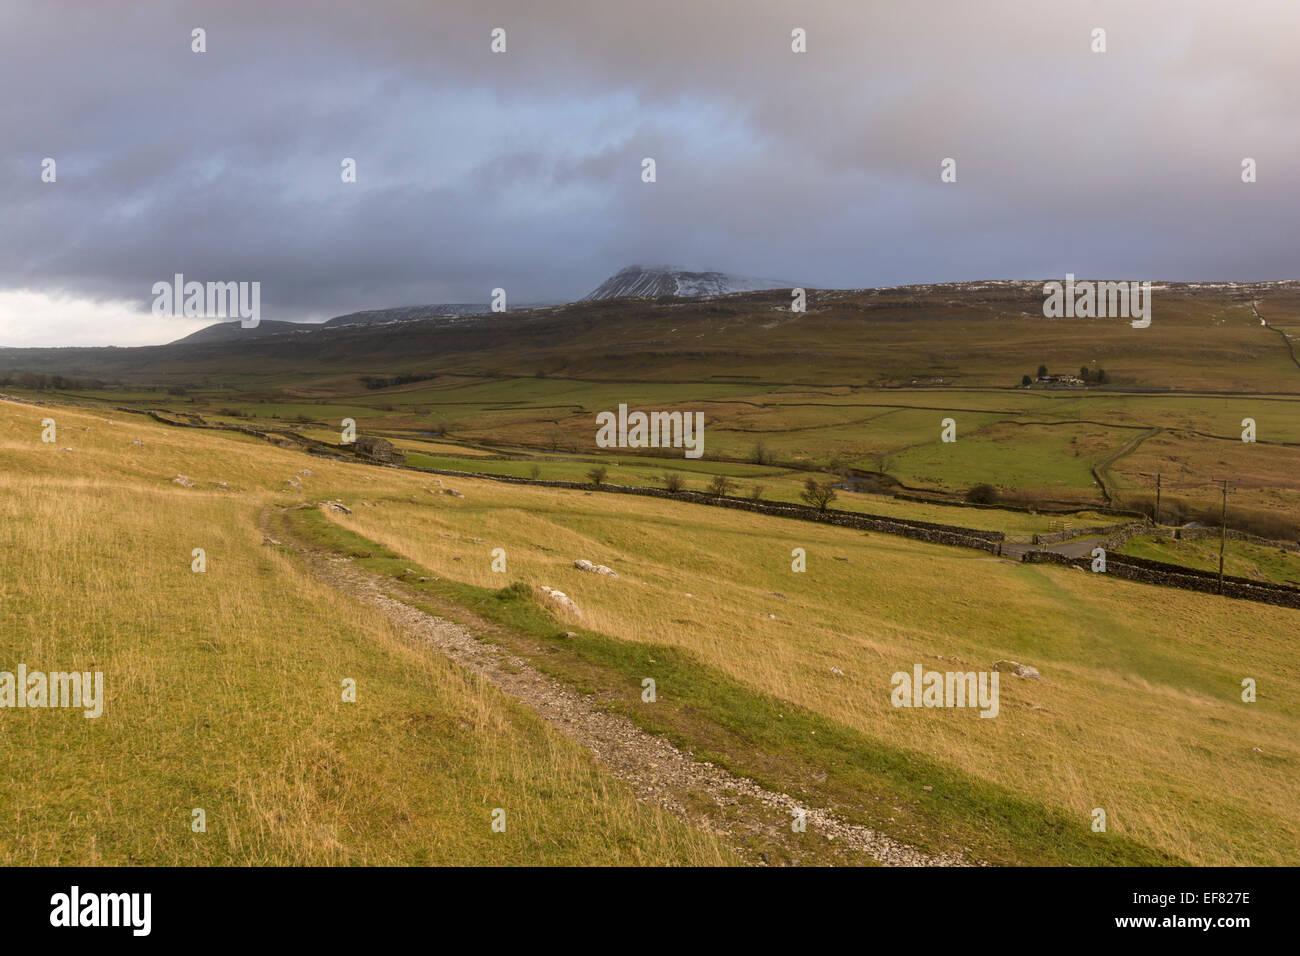 Ingleborough Hill near Ingleton, Yorkshire Dales, North Yorkshire, UK - Stock Image